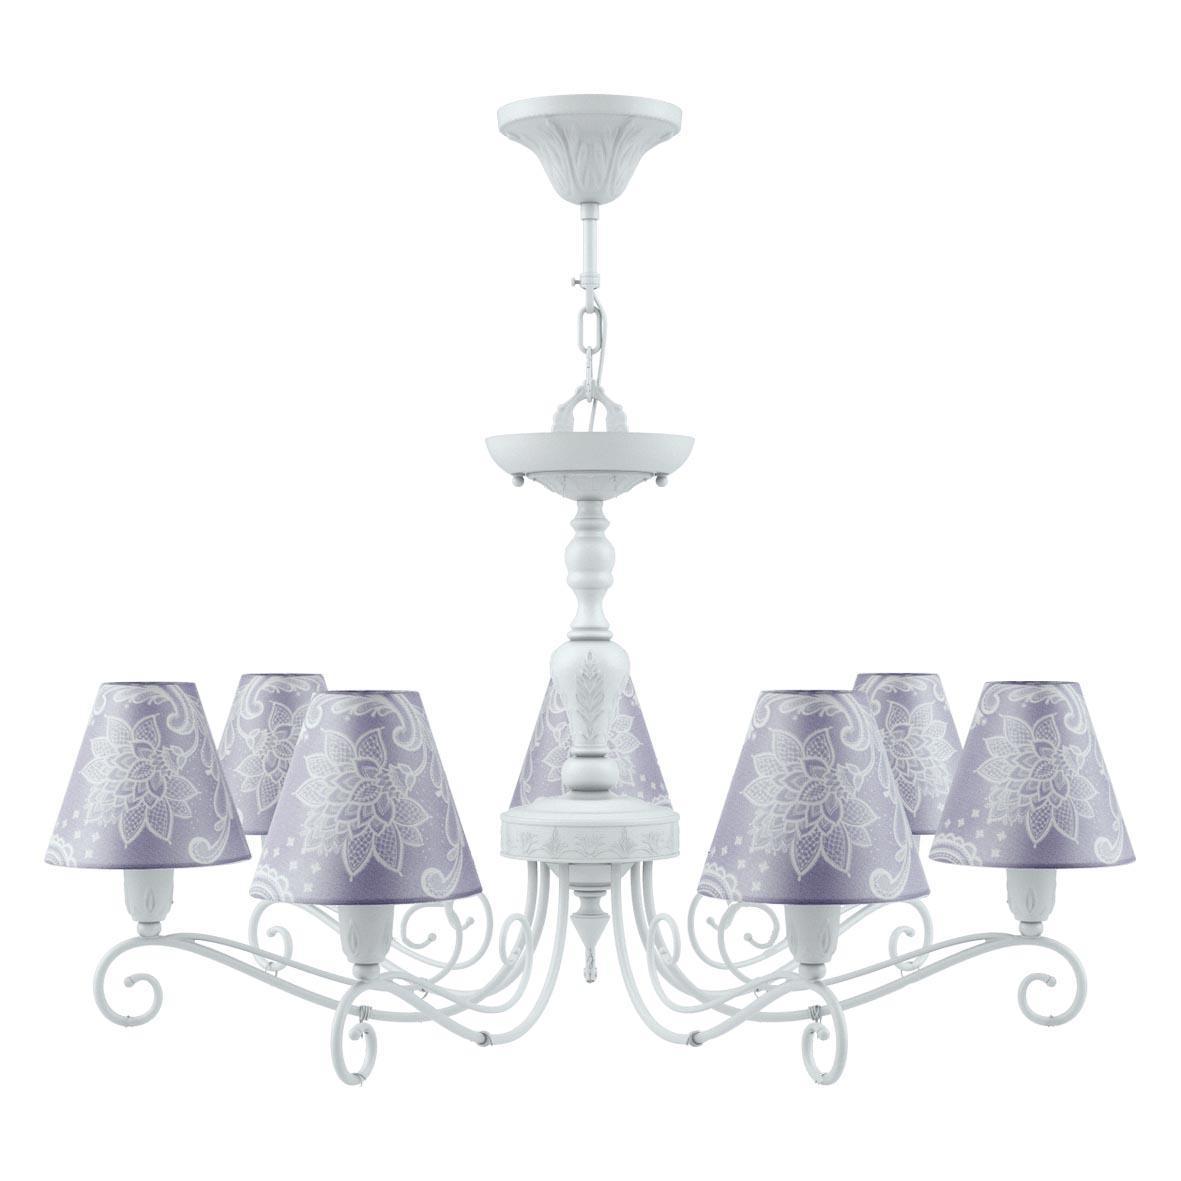 Подвесная люстра Lamp4you Provence E4-07-WM-LMP-O-3 бра lamp4you e 01 wm lmp o 25